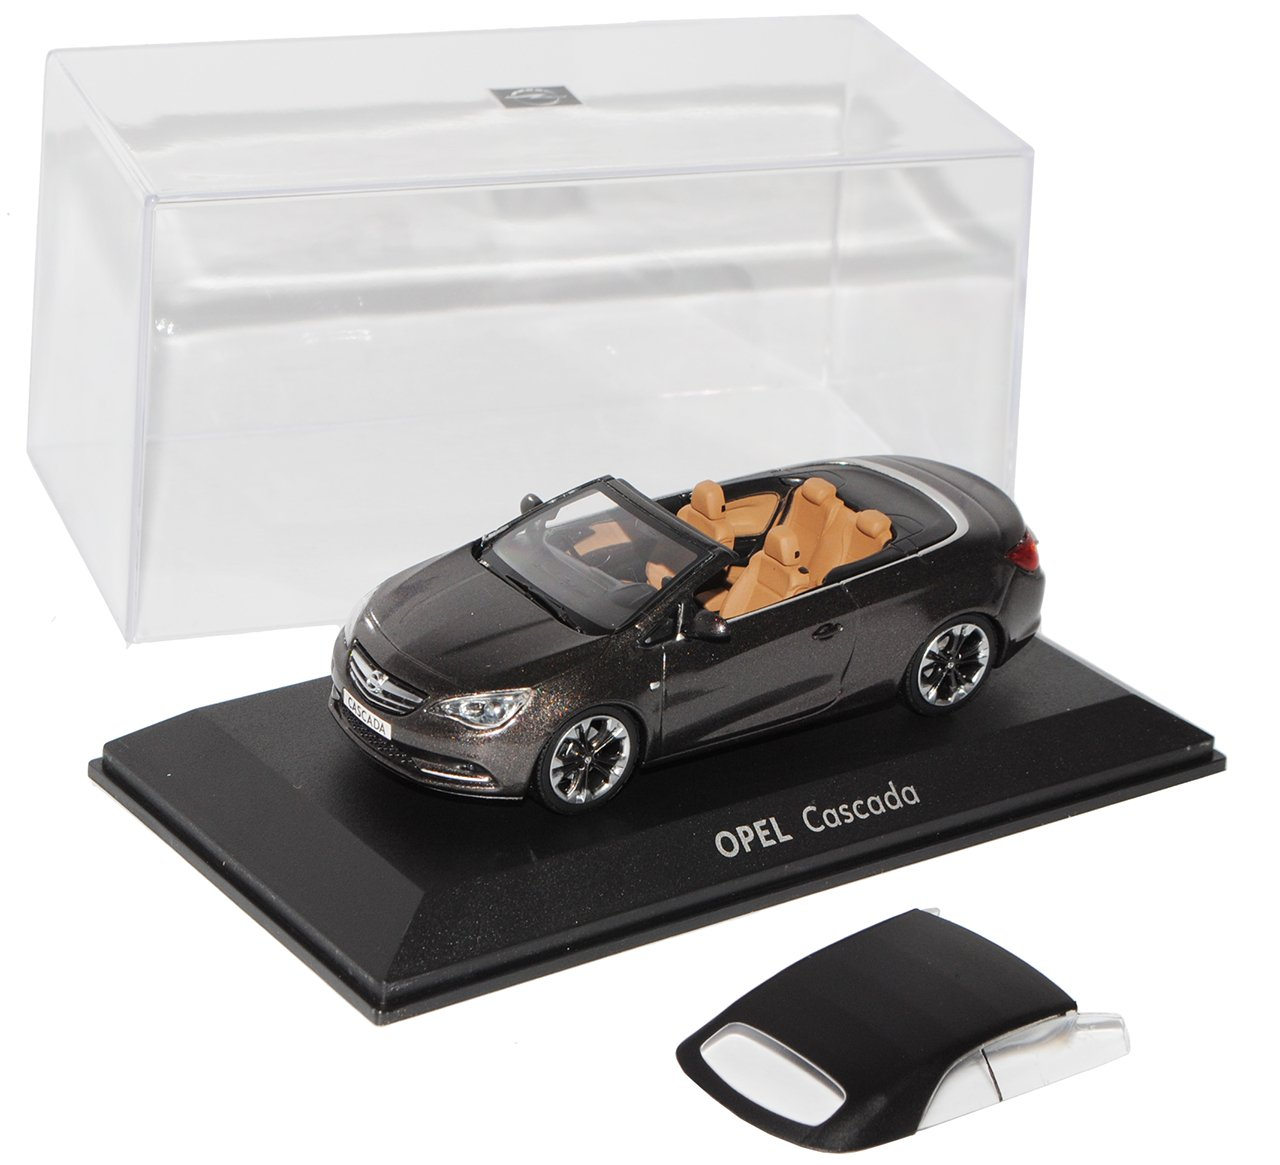 Minichamps Opel Cascada Asteroid Grau Cabrio Offen mit Soft Top 1/43 Modell Auto